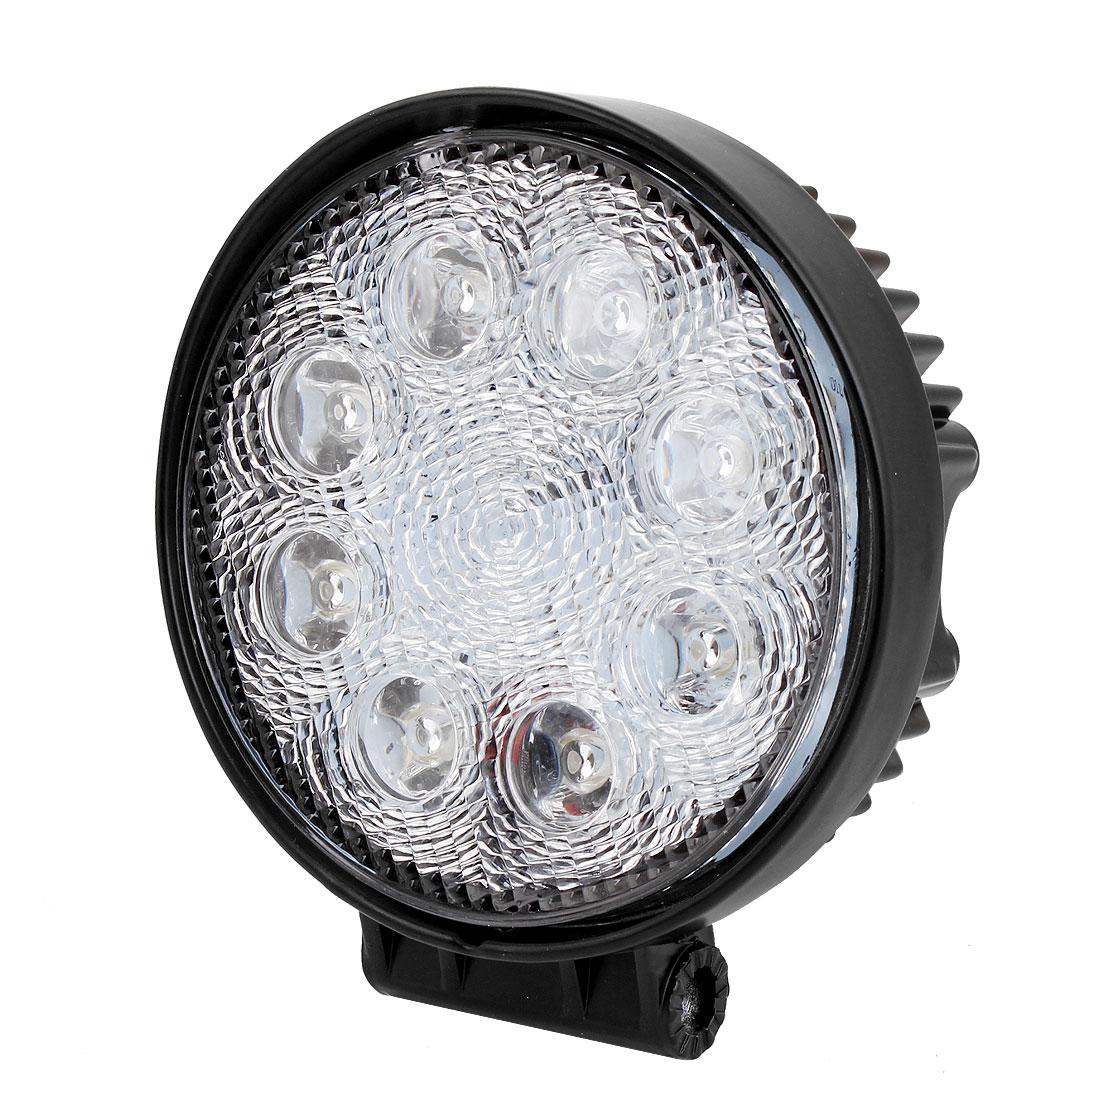 24W 8 LED Spot Beam Work Light Fog Driving Lamp for Offroad ATV SUV Jeep